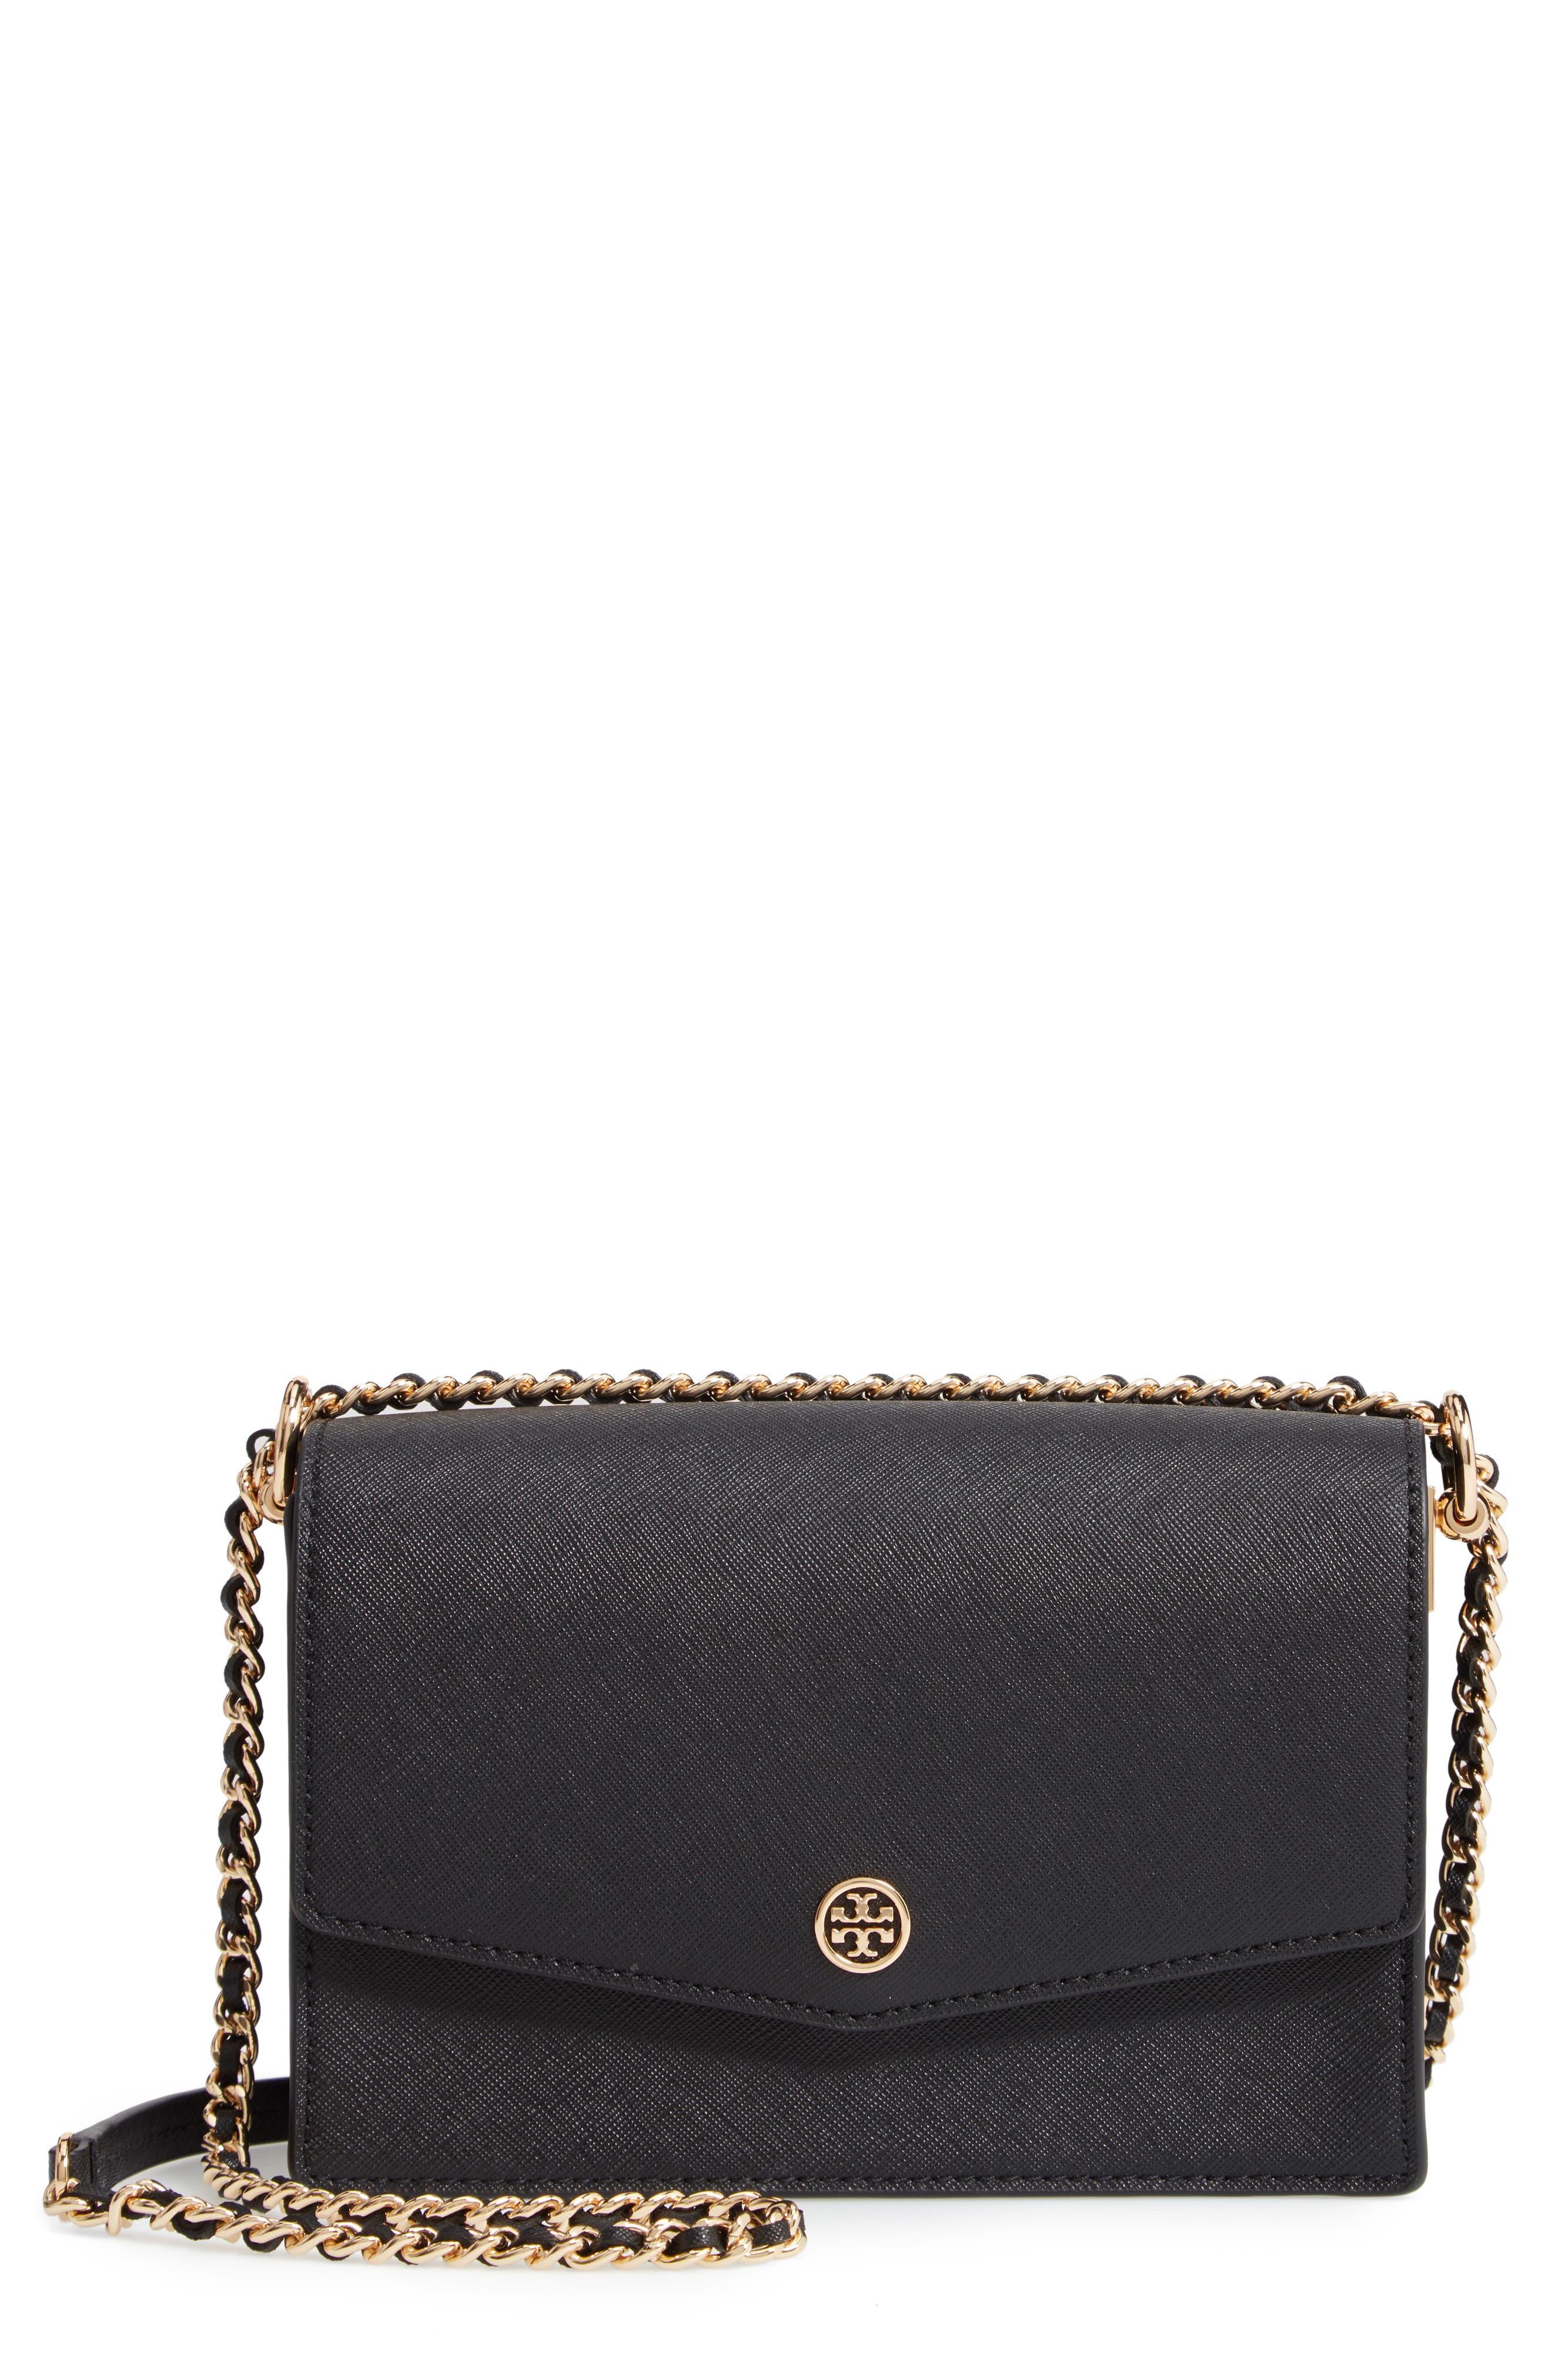 Mini Robinson Convertible Leather Shoulder Bag,                         Main,                         color, BLACK